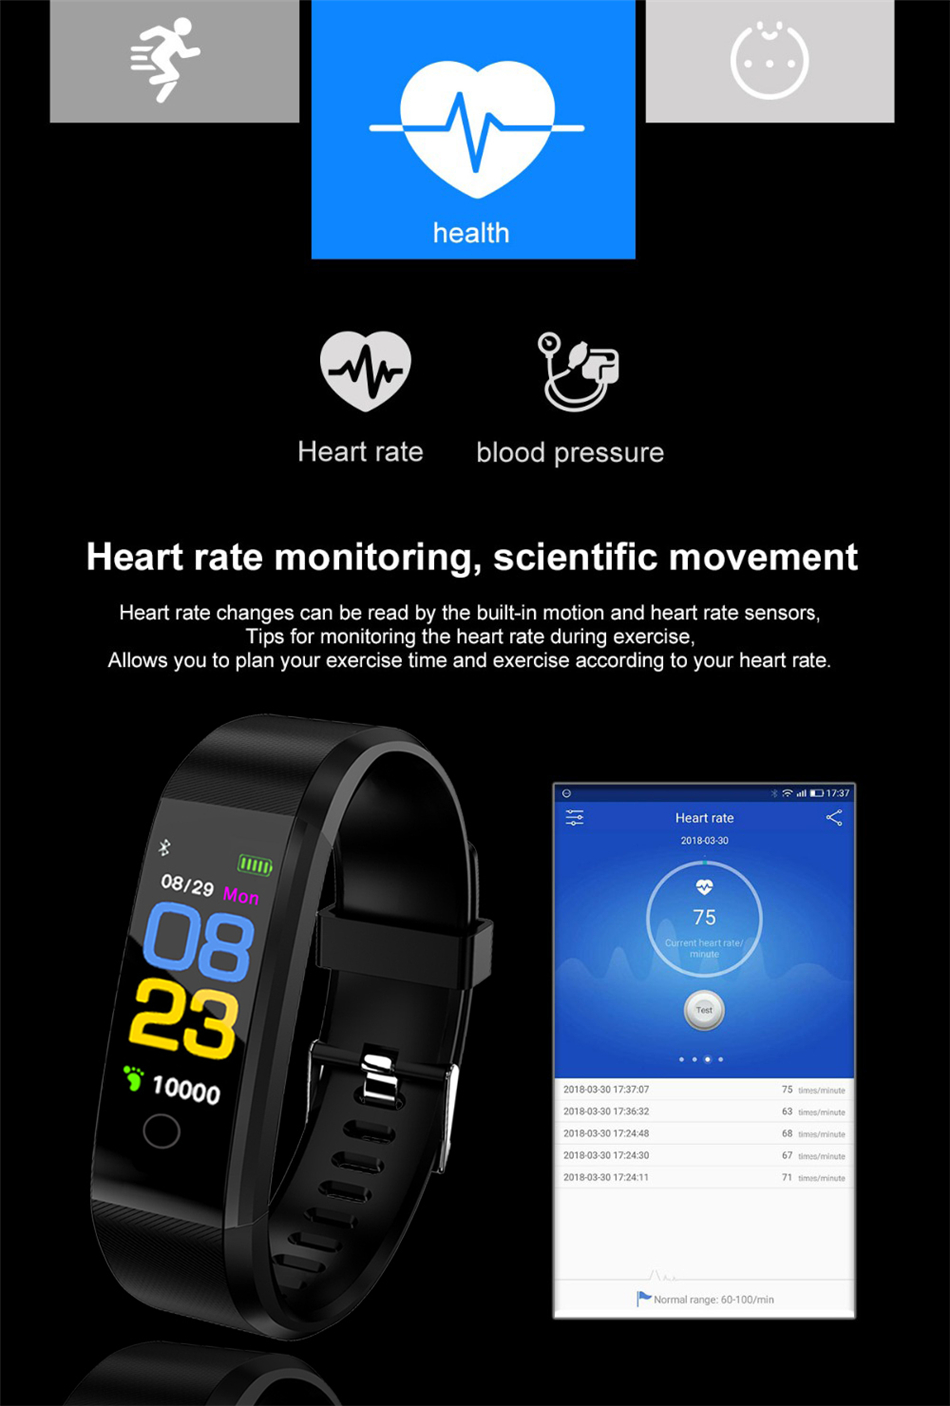 HTB1H72gE1uSBuNjSsziq6zq8pXaY LIGE New Smart Watch Men Women Heart Rate Monitor Blood Pressure Fitness Tracker Smartwatch Sport Smart Bracelet for ios android